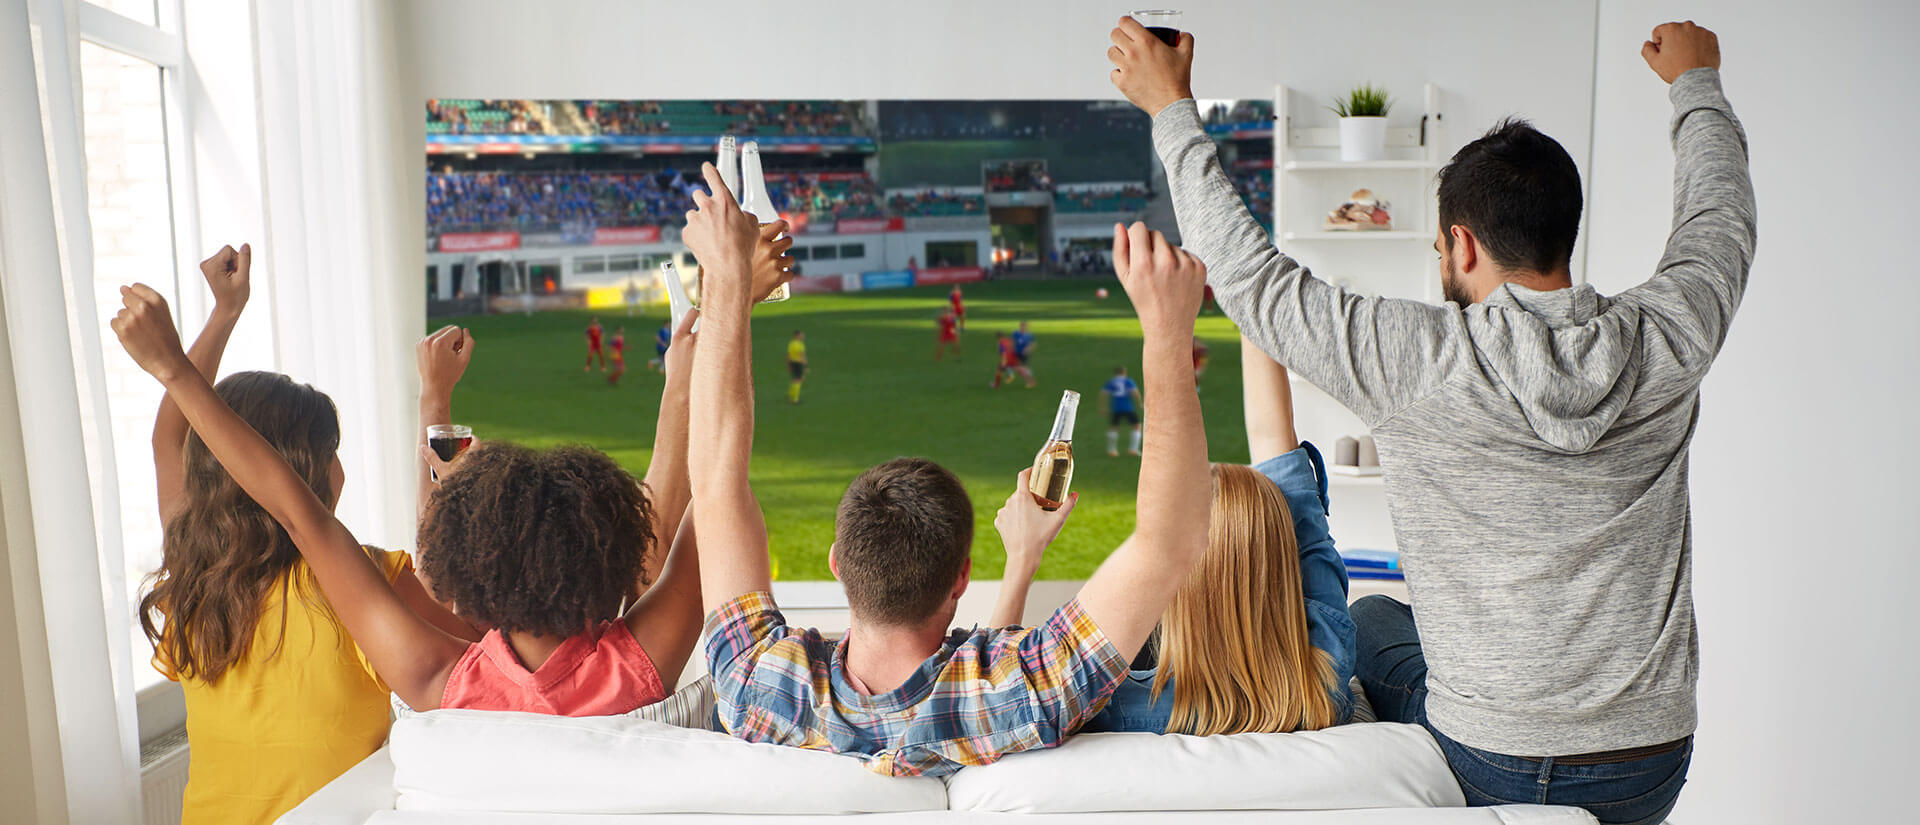 Smart-TV-Projector